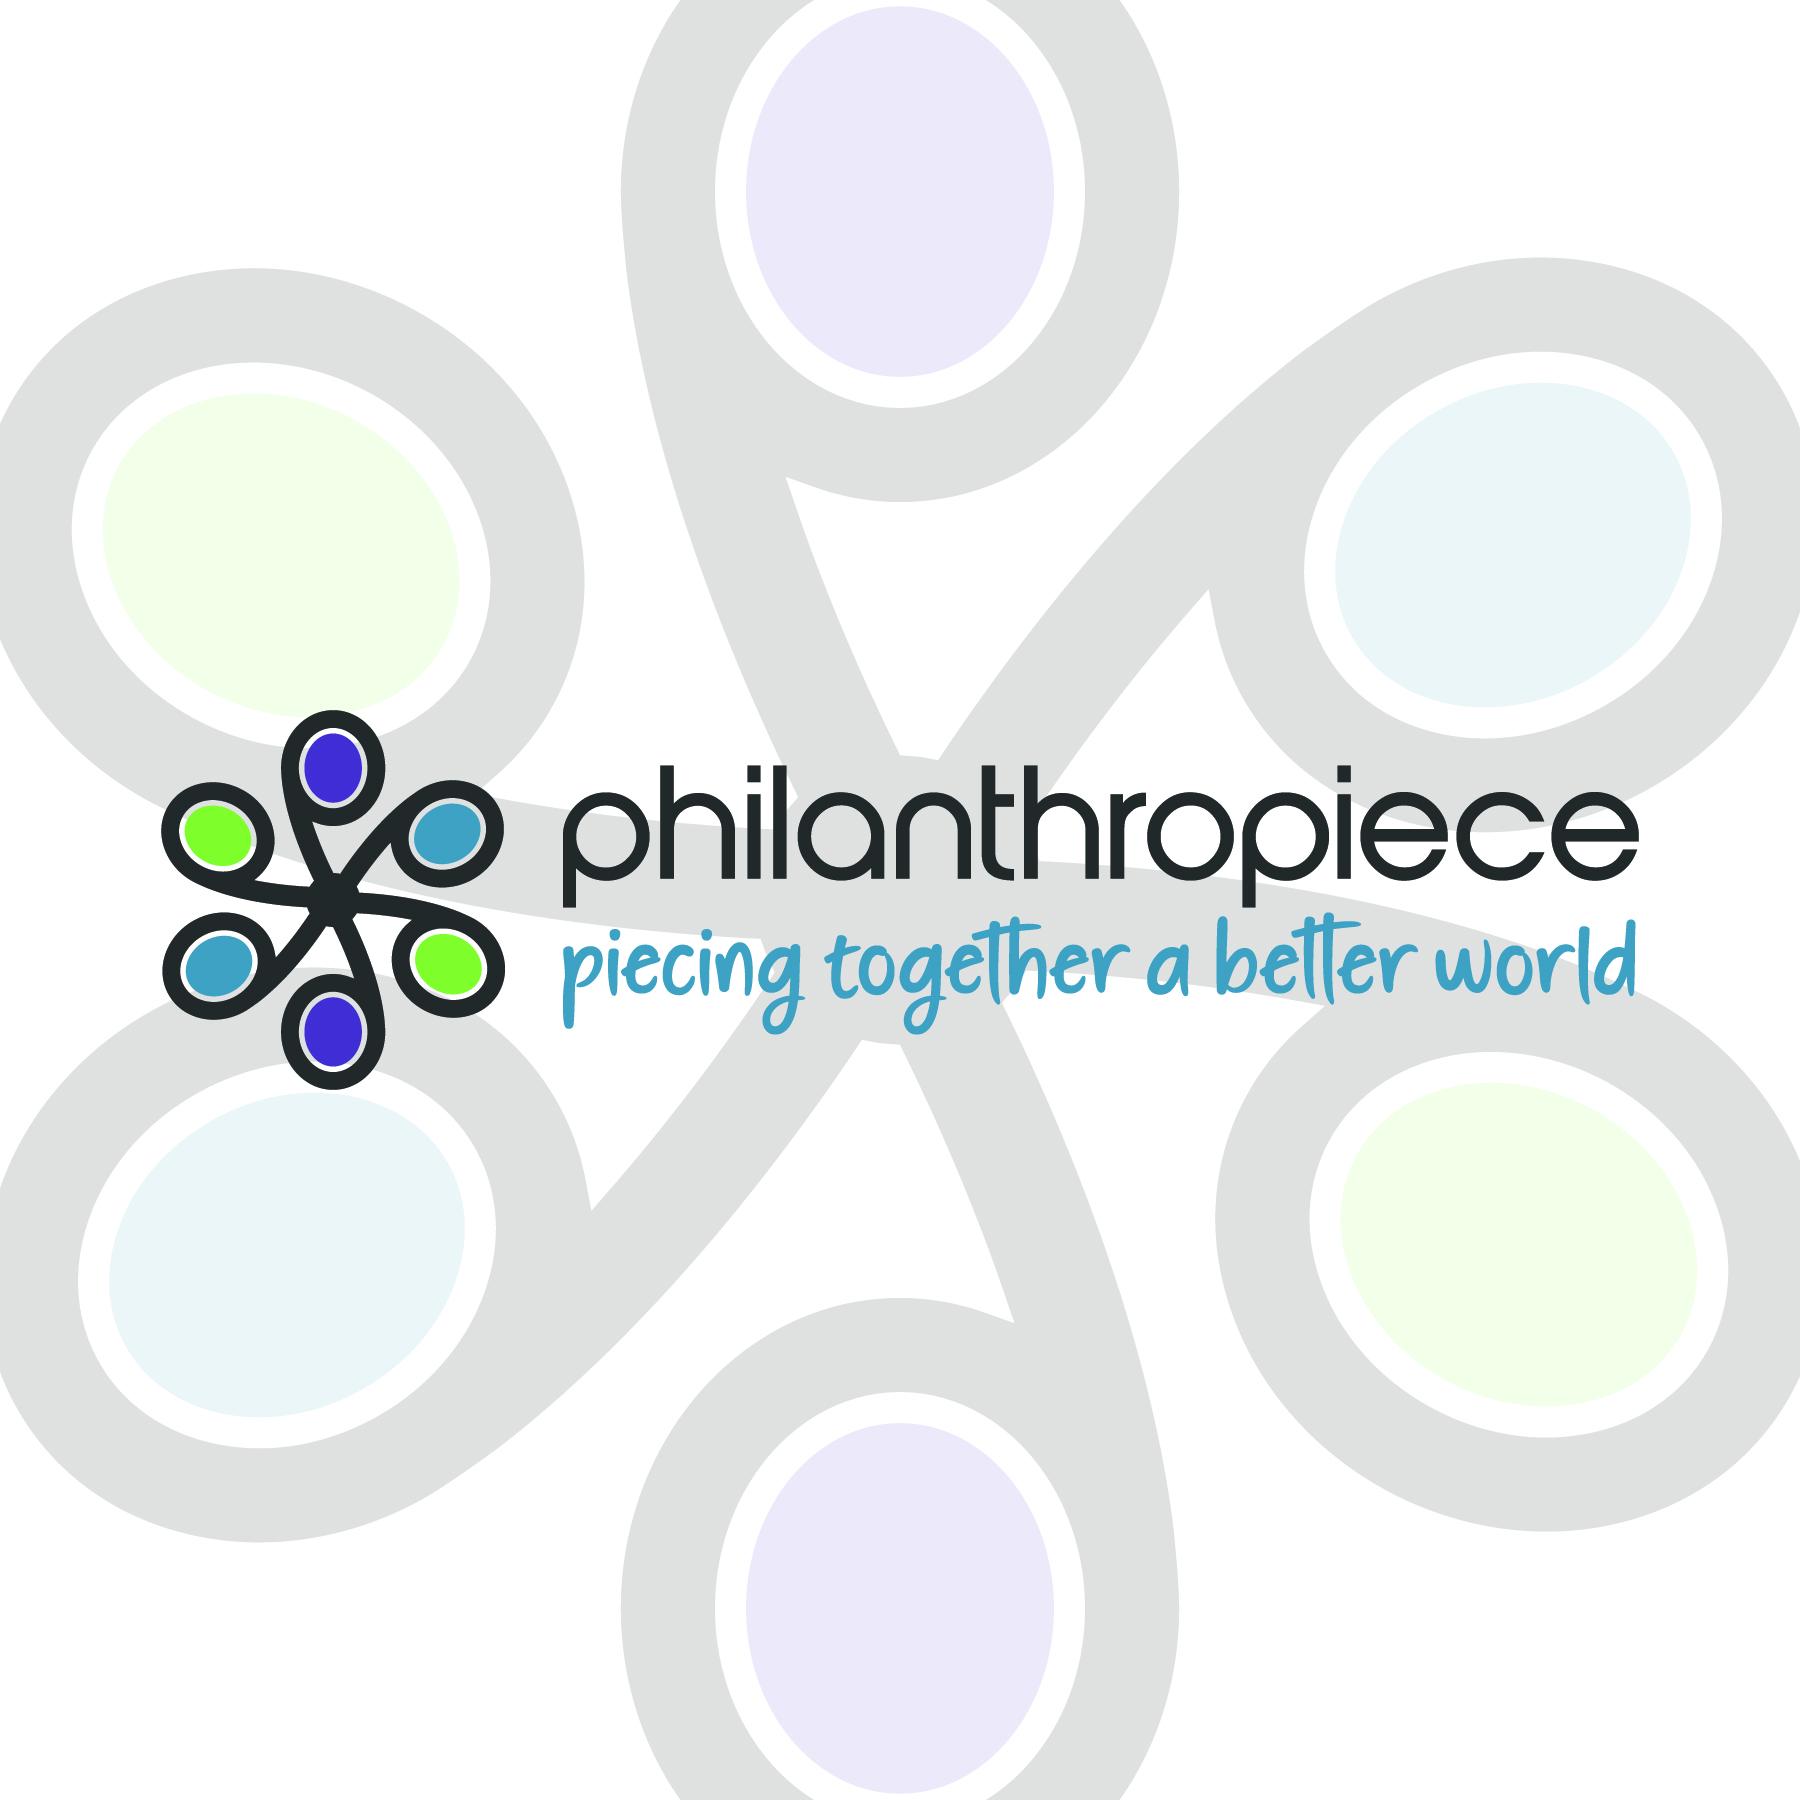 philanthro-01.jpg